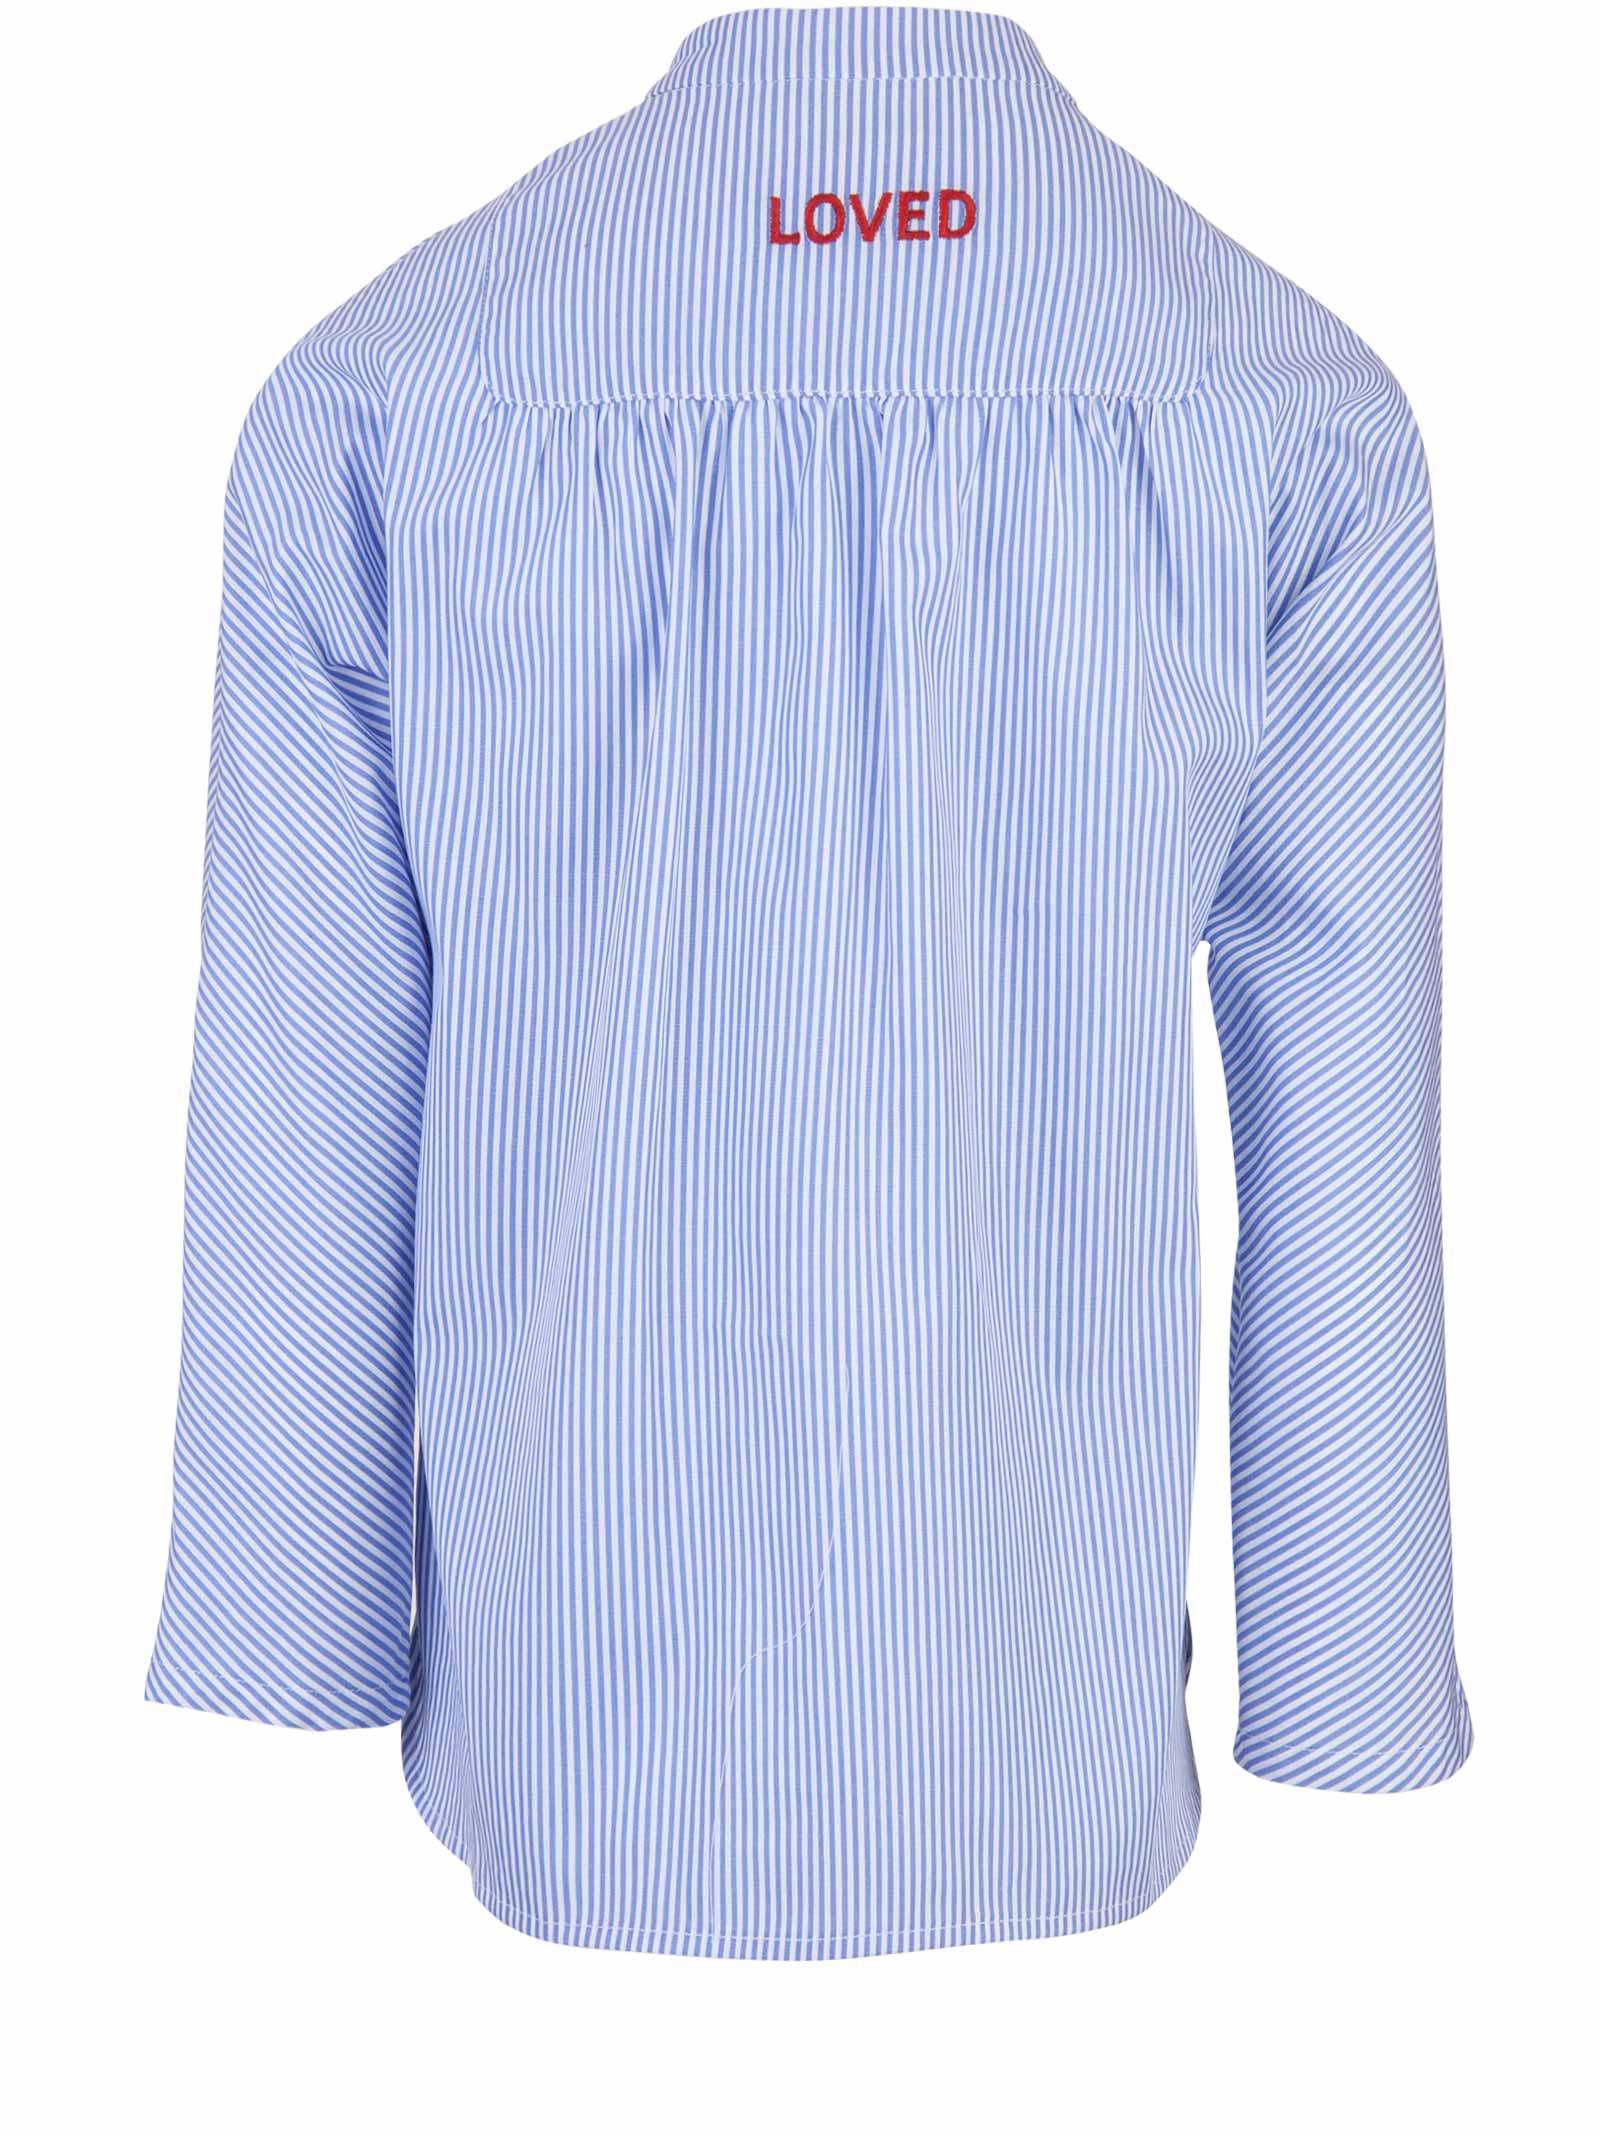 544f0116 Michele Franzese Moda. 0. Gucci Junior Shirt Gucci Junior | -1043906350 |  516343XBE669044